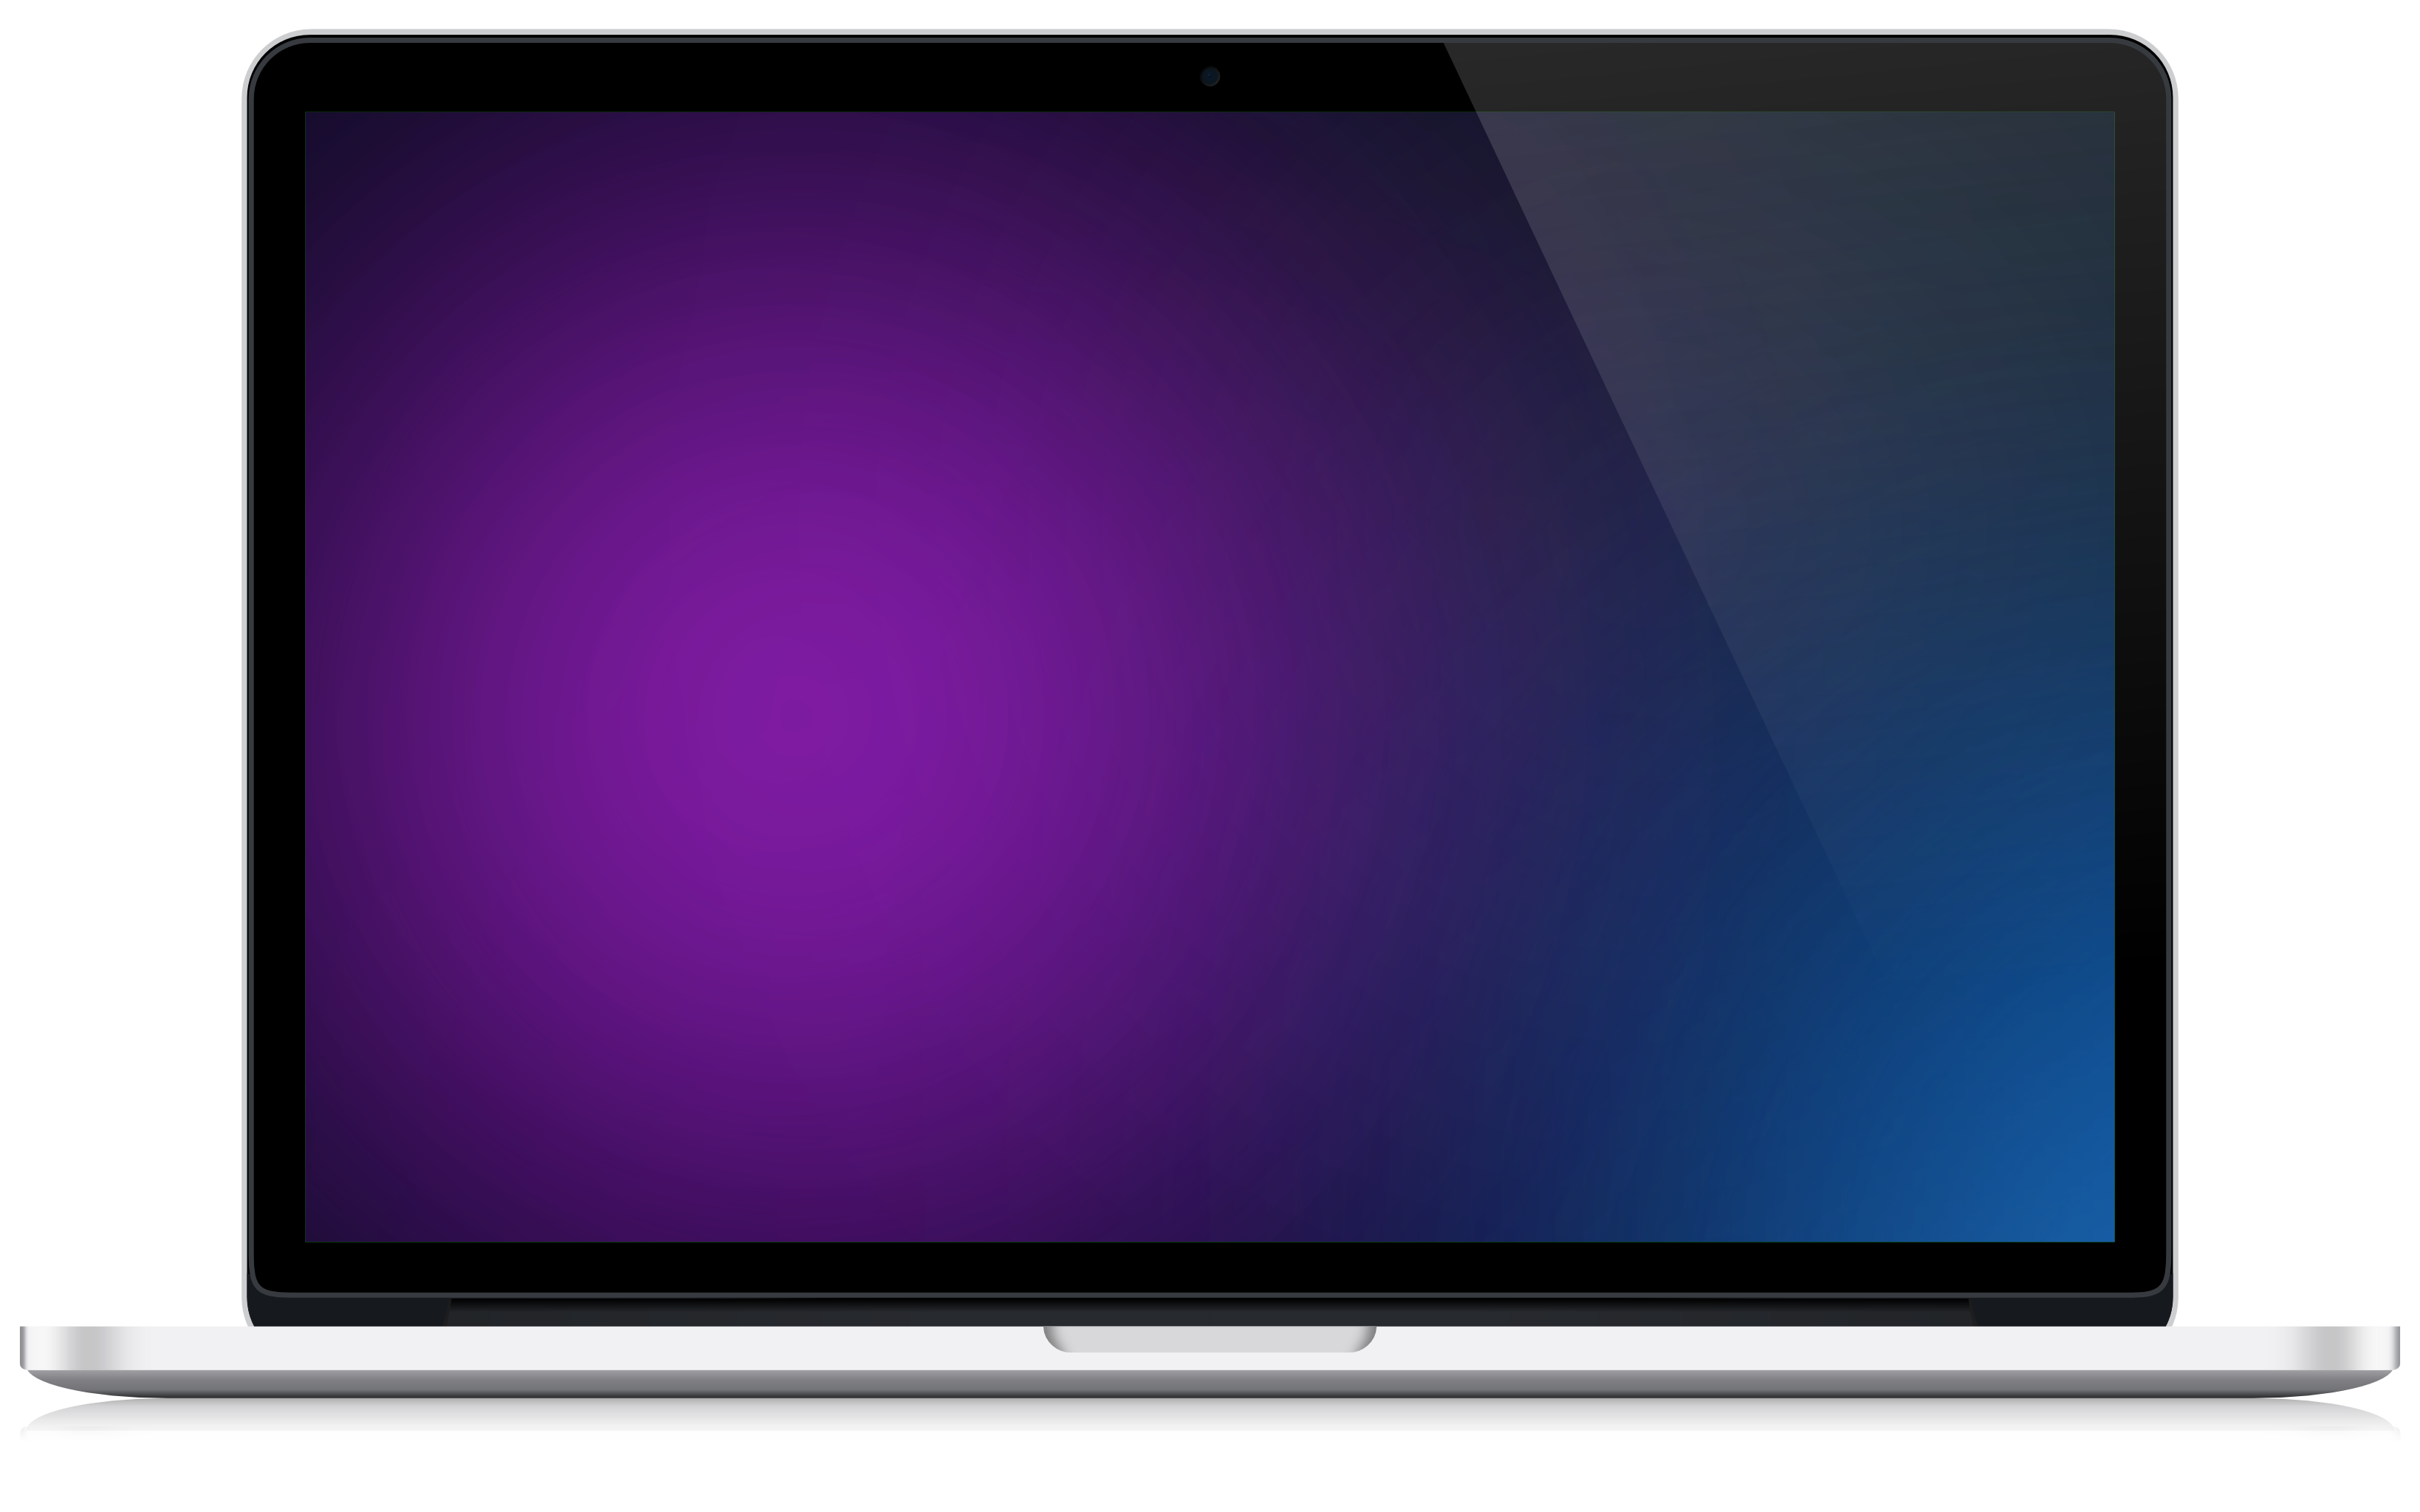 MacBook Pro (retina display) by TheGoldenBox on DeviantArt